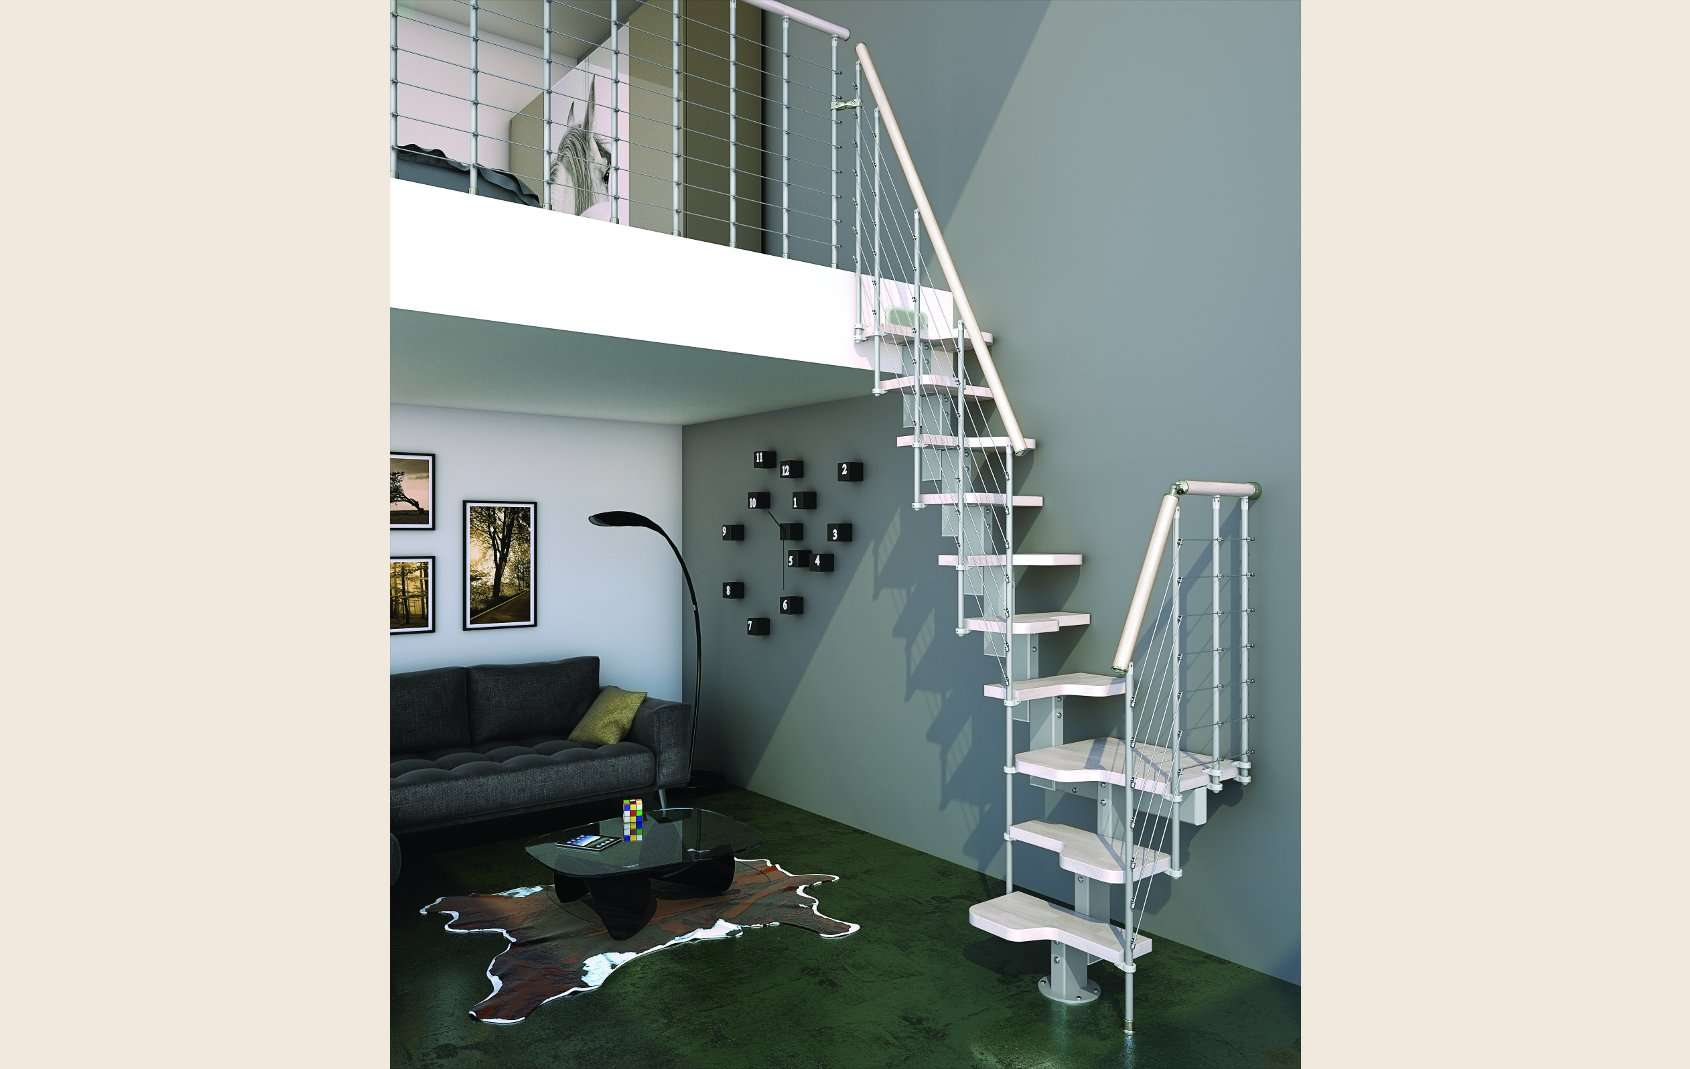 Escaleras italianas escaleras de madera maciza for Escaleras modernas para espacios pequenos